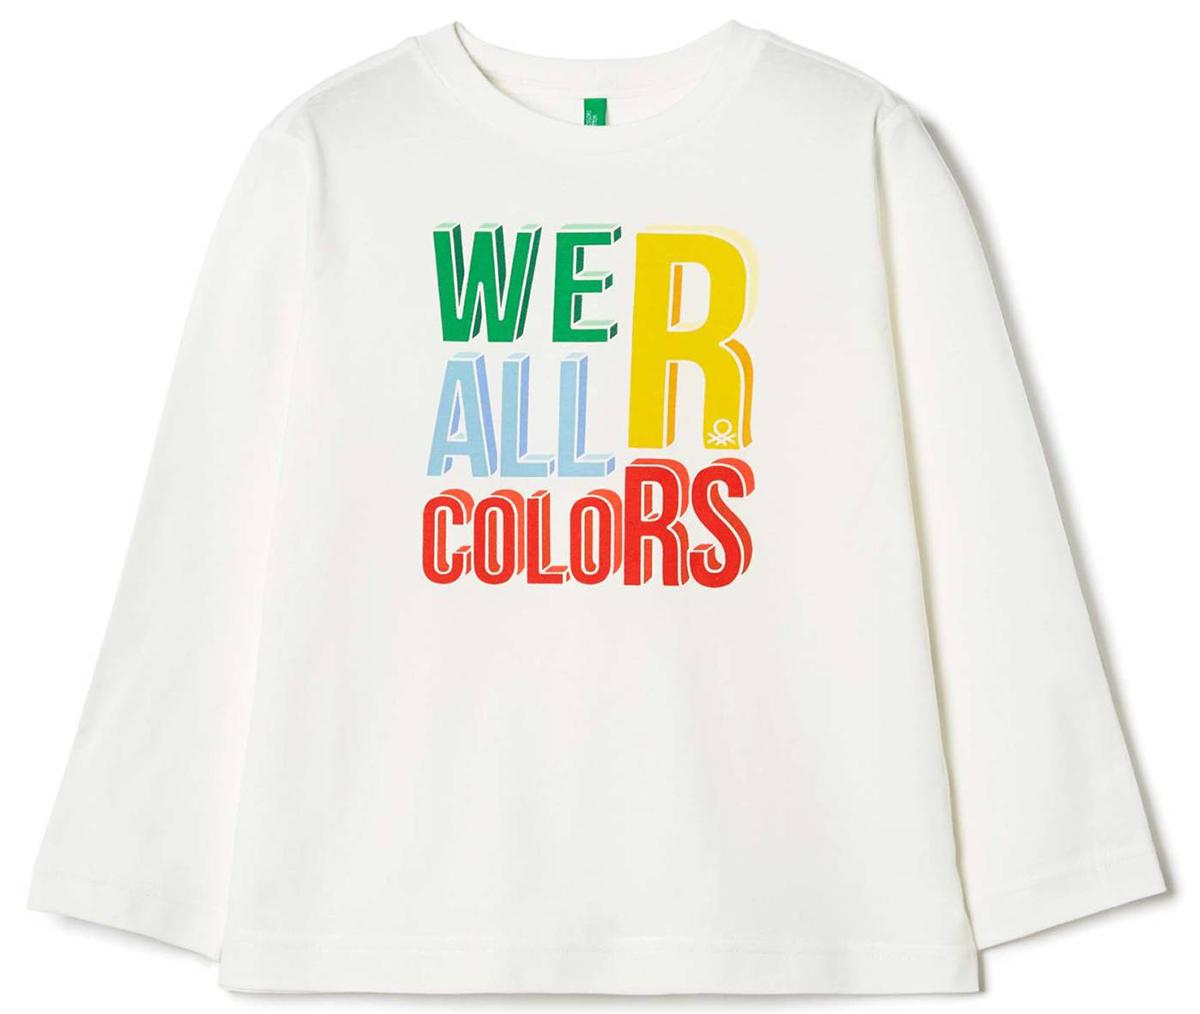 Майка для мальчиков United Colors of Benetton, цвет: белый. 3I1XC1389_074. Размер 903I1XC1389_074